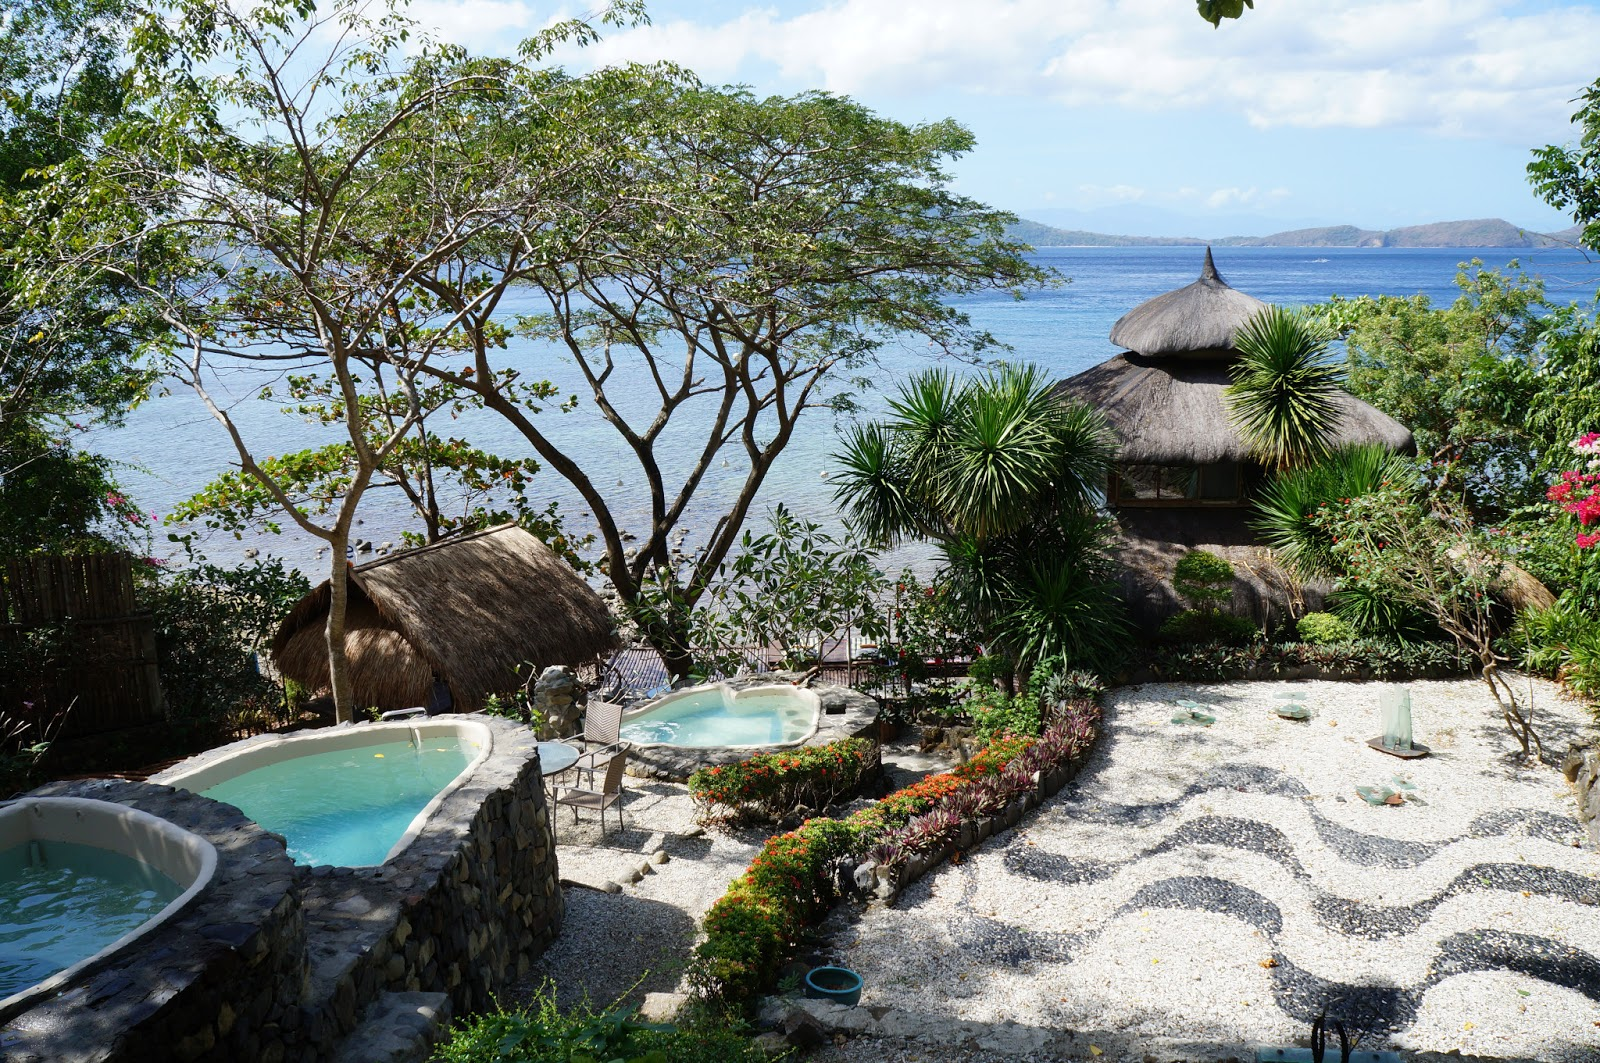 Casita Ysabel A Paradise Weekend Getaway In Mabini Batangas Jeepney Manila